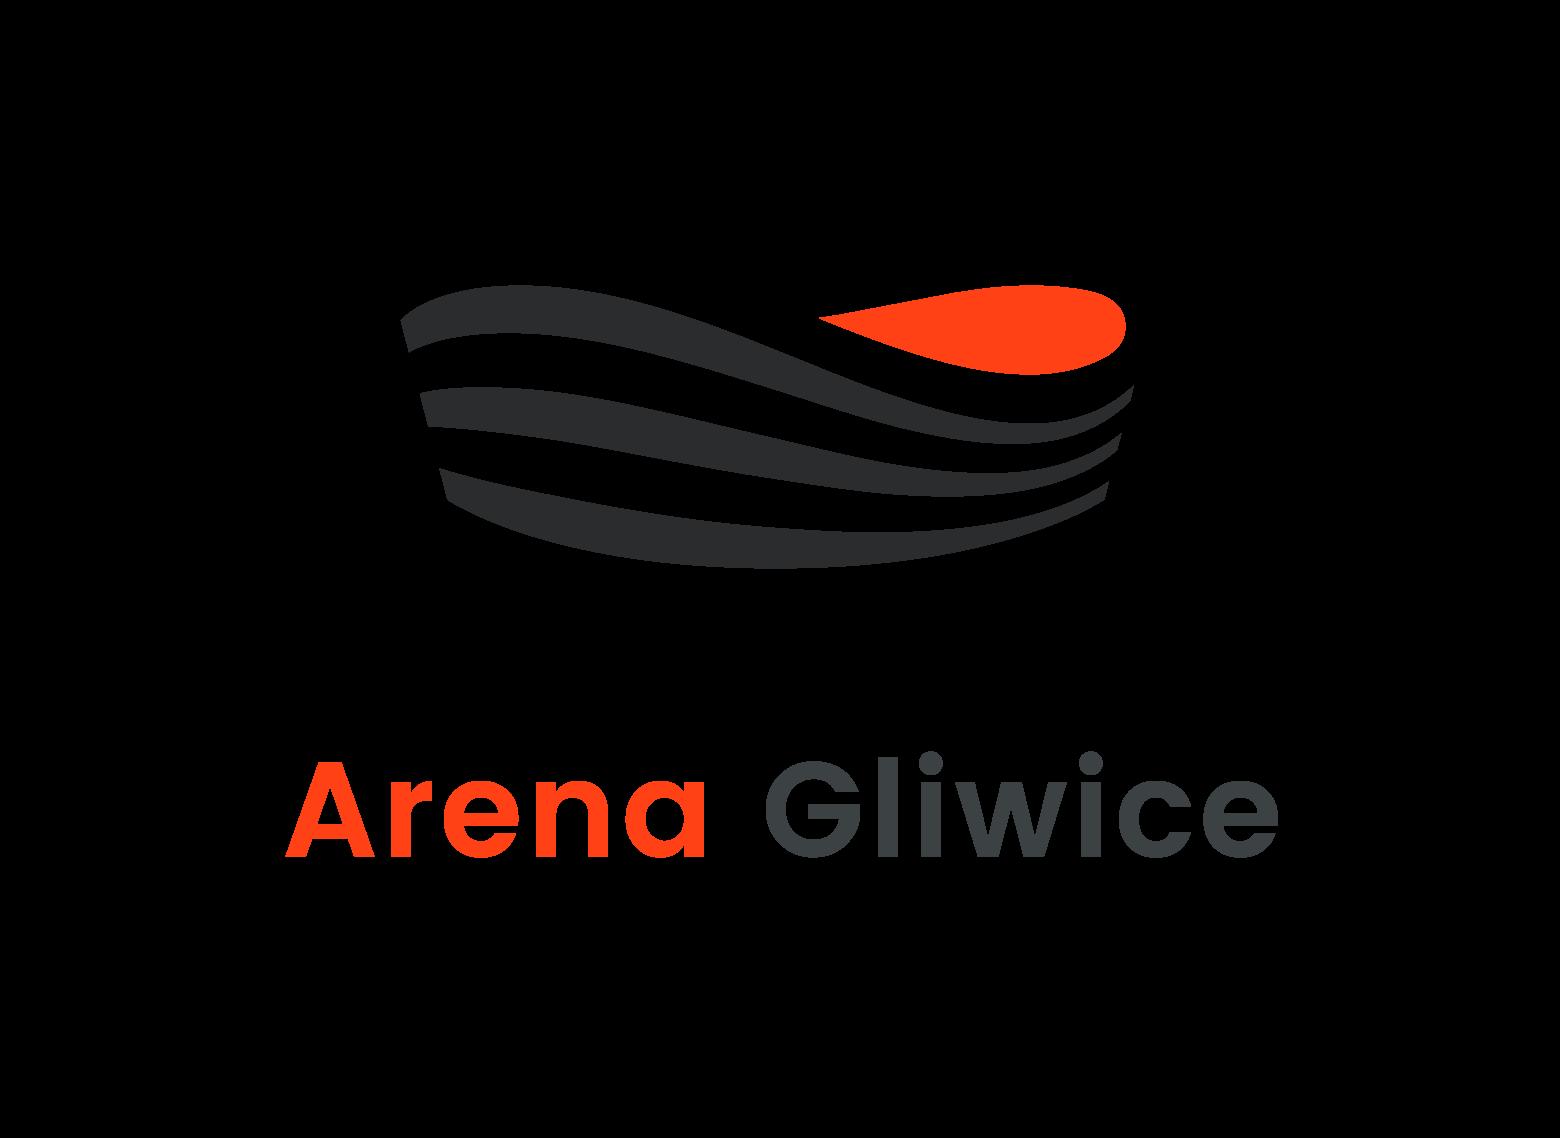 logo areny gliwice